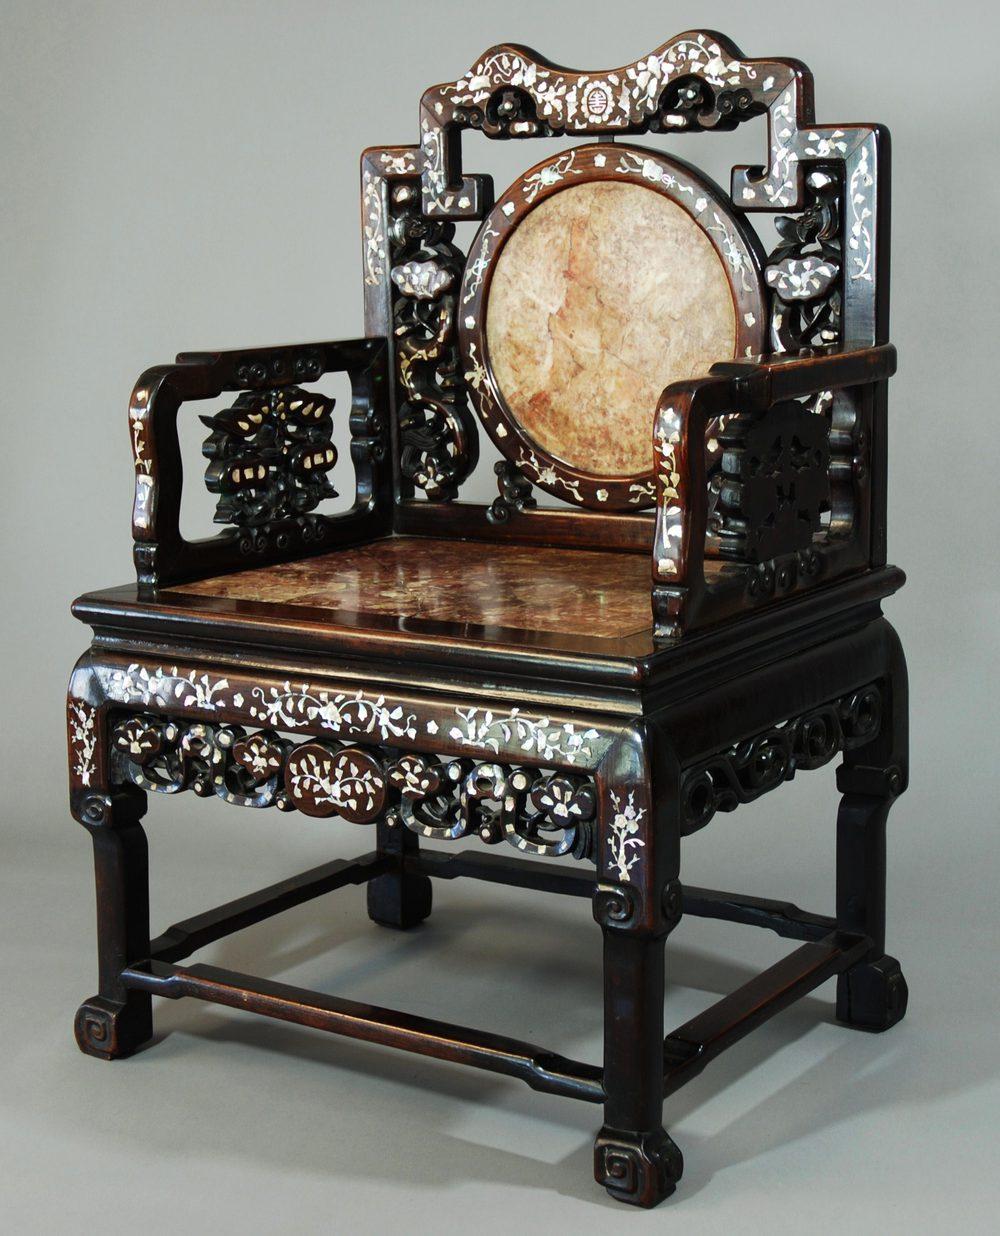 19thc Chinese Qing Dynasty Inlaid Hongmu Chair  Antiques